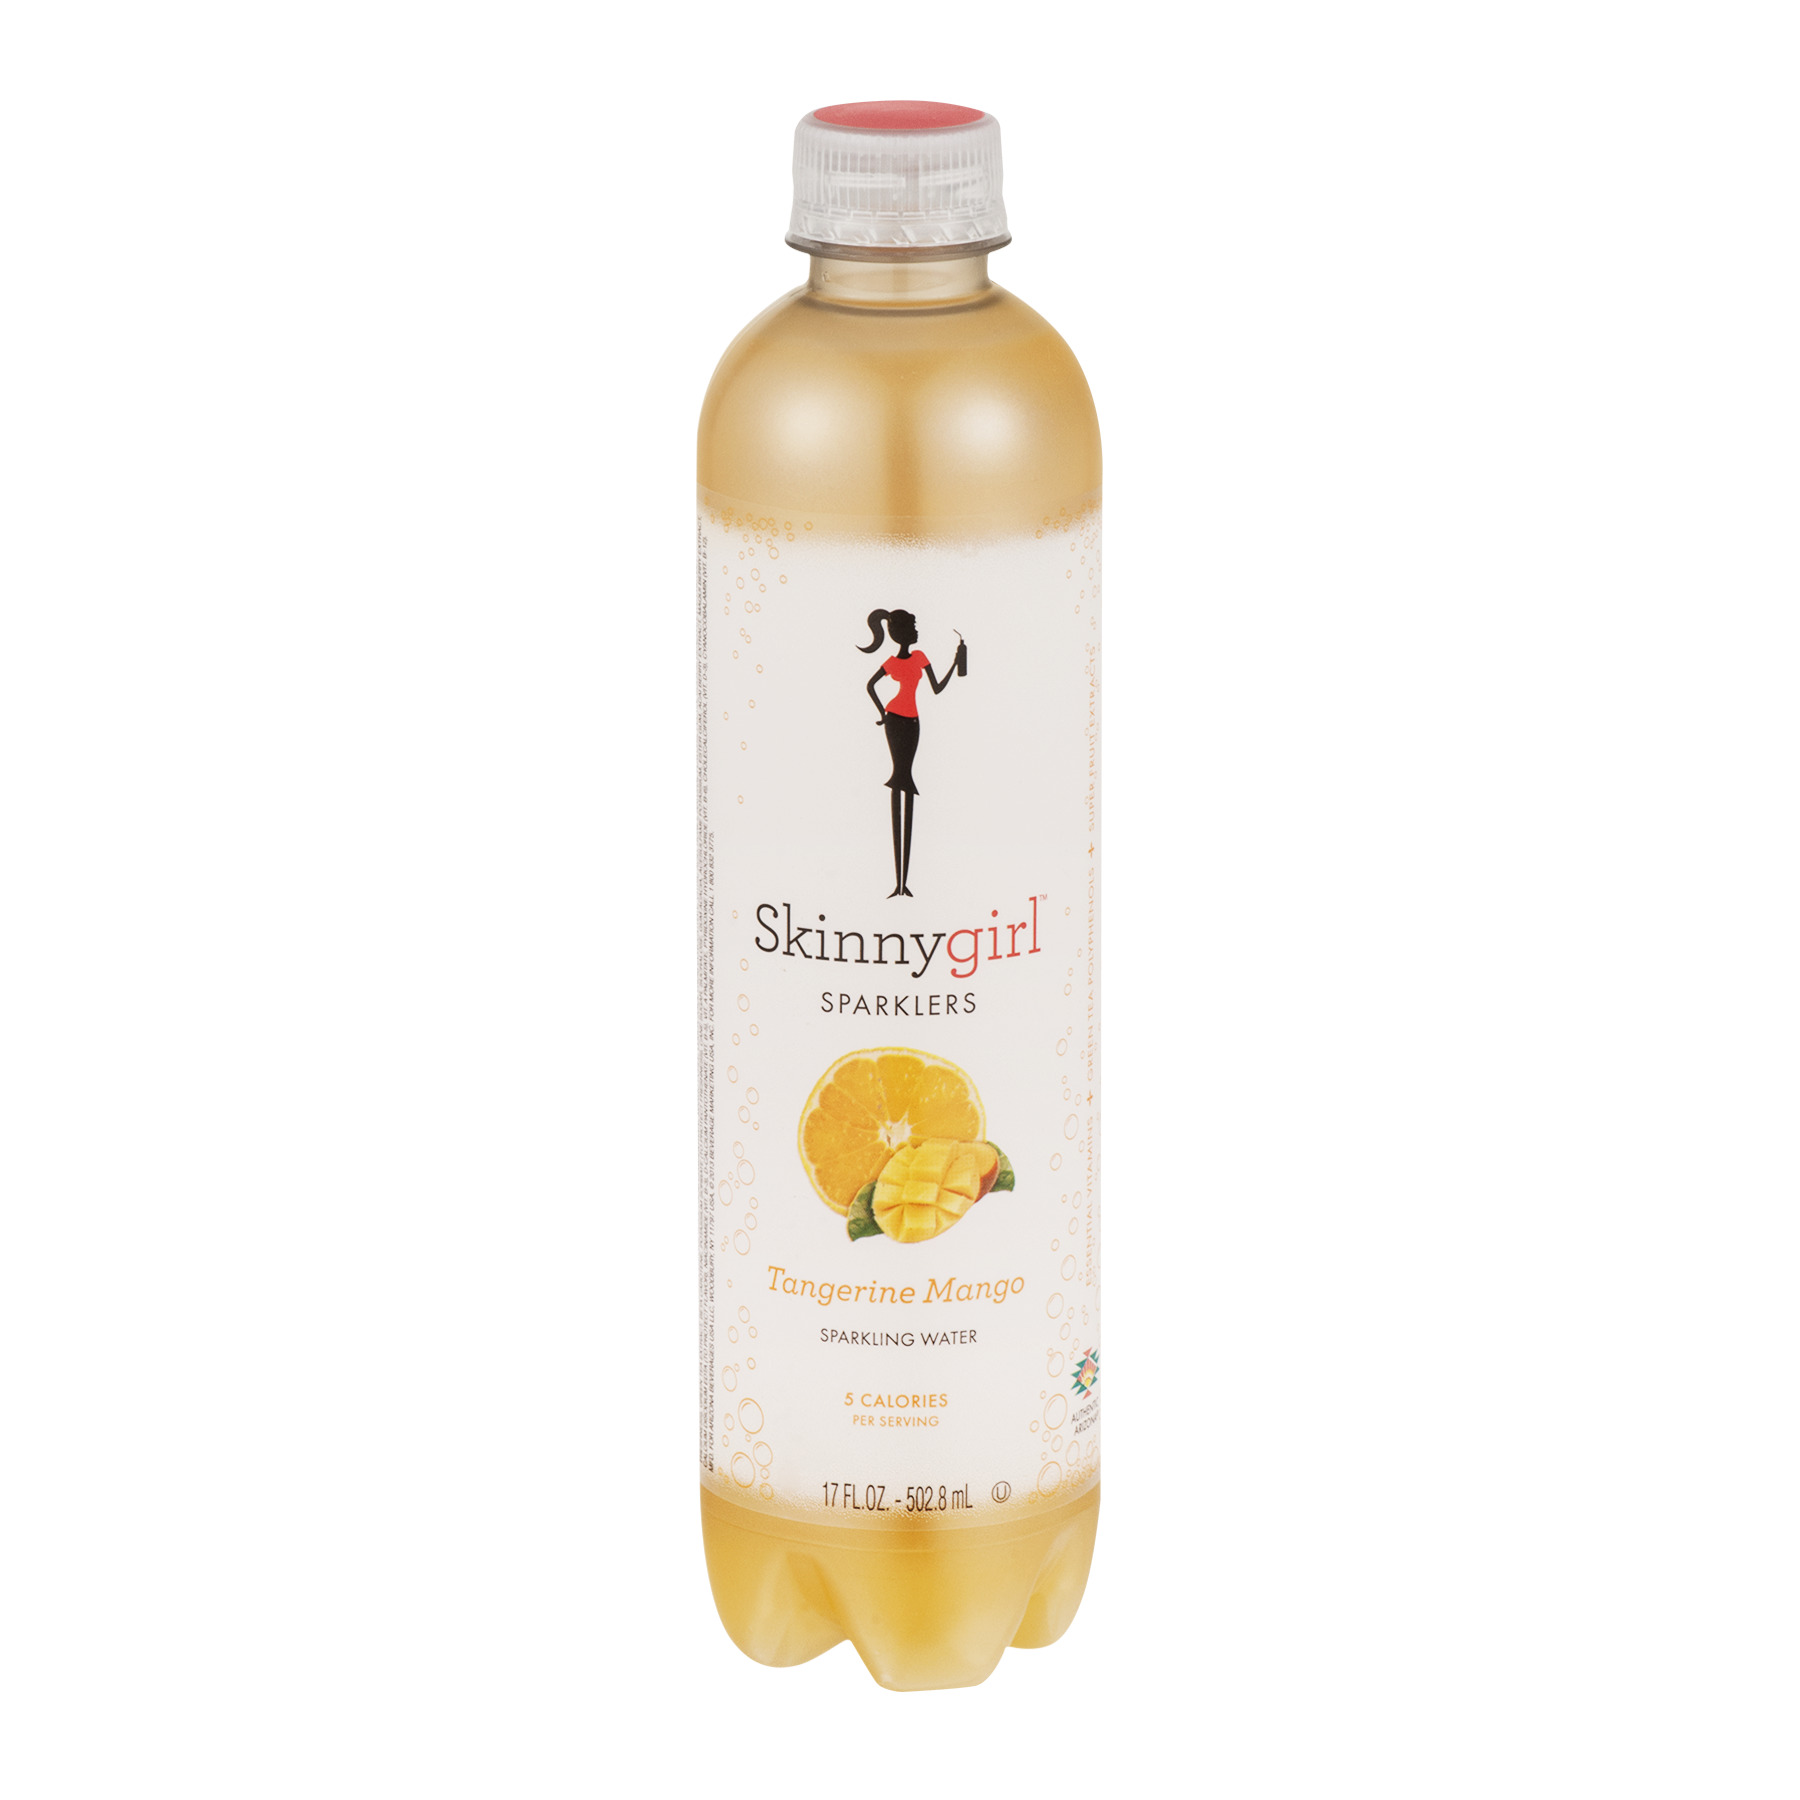 Skinnygirl Sparklers Sparkling Water Tangerine Mango, 17.0 FL OZ